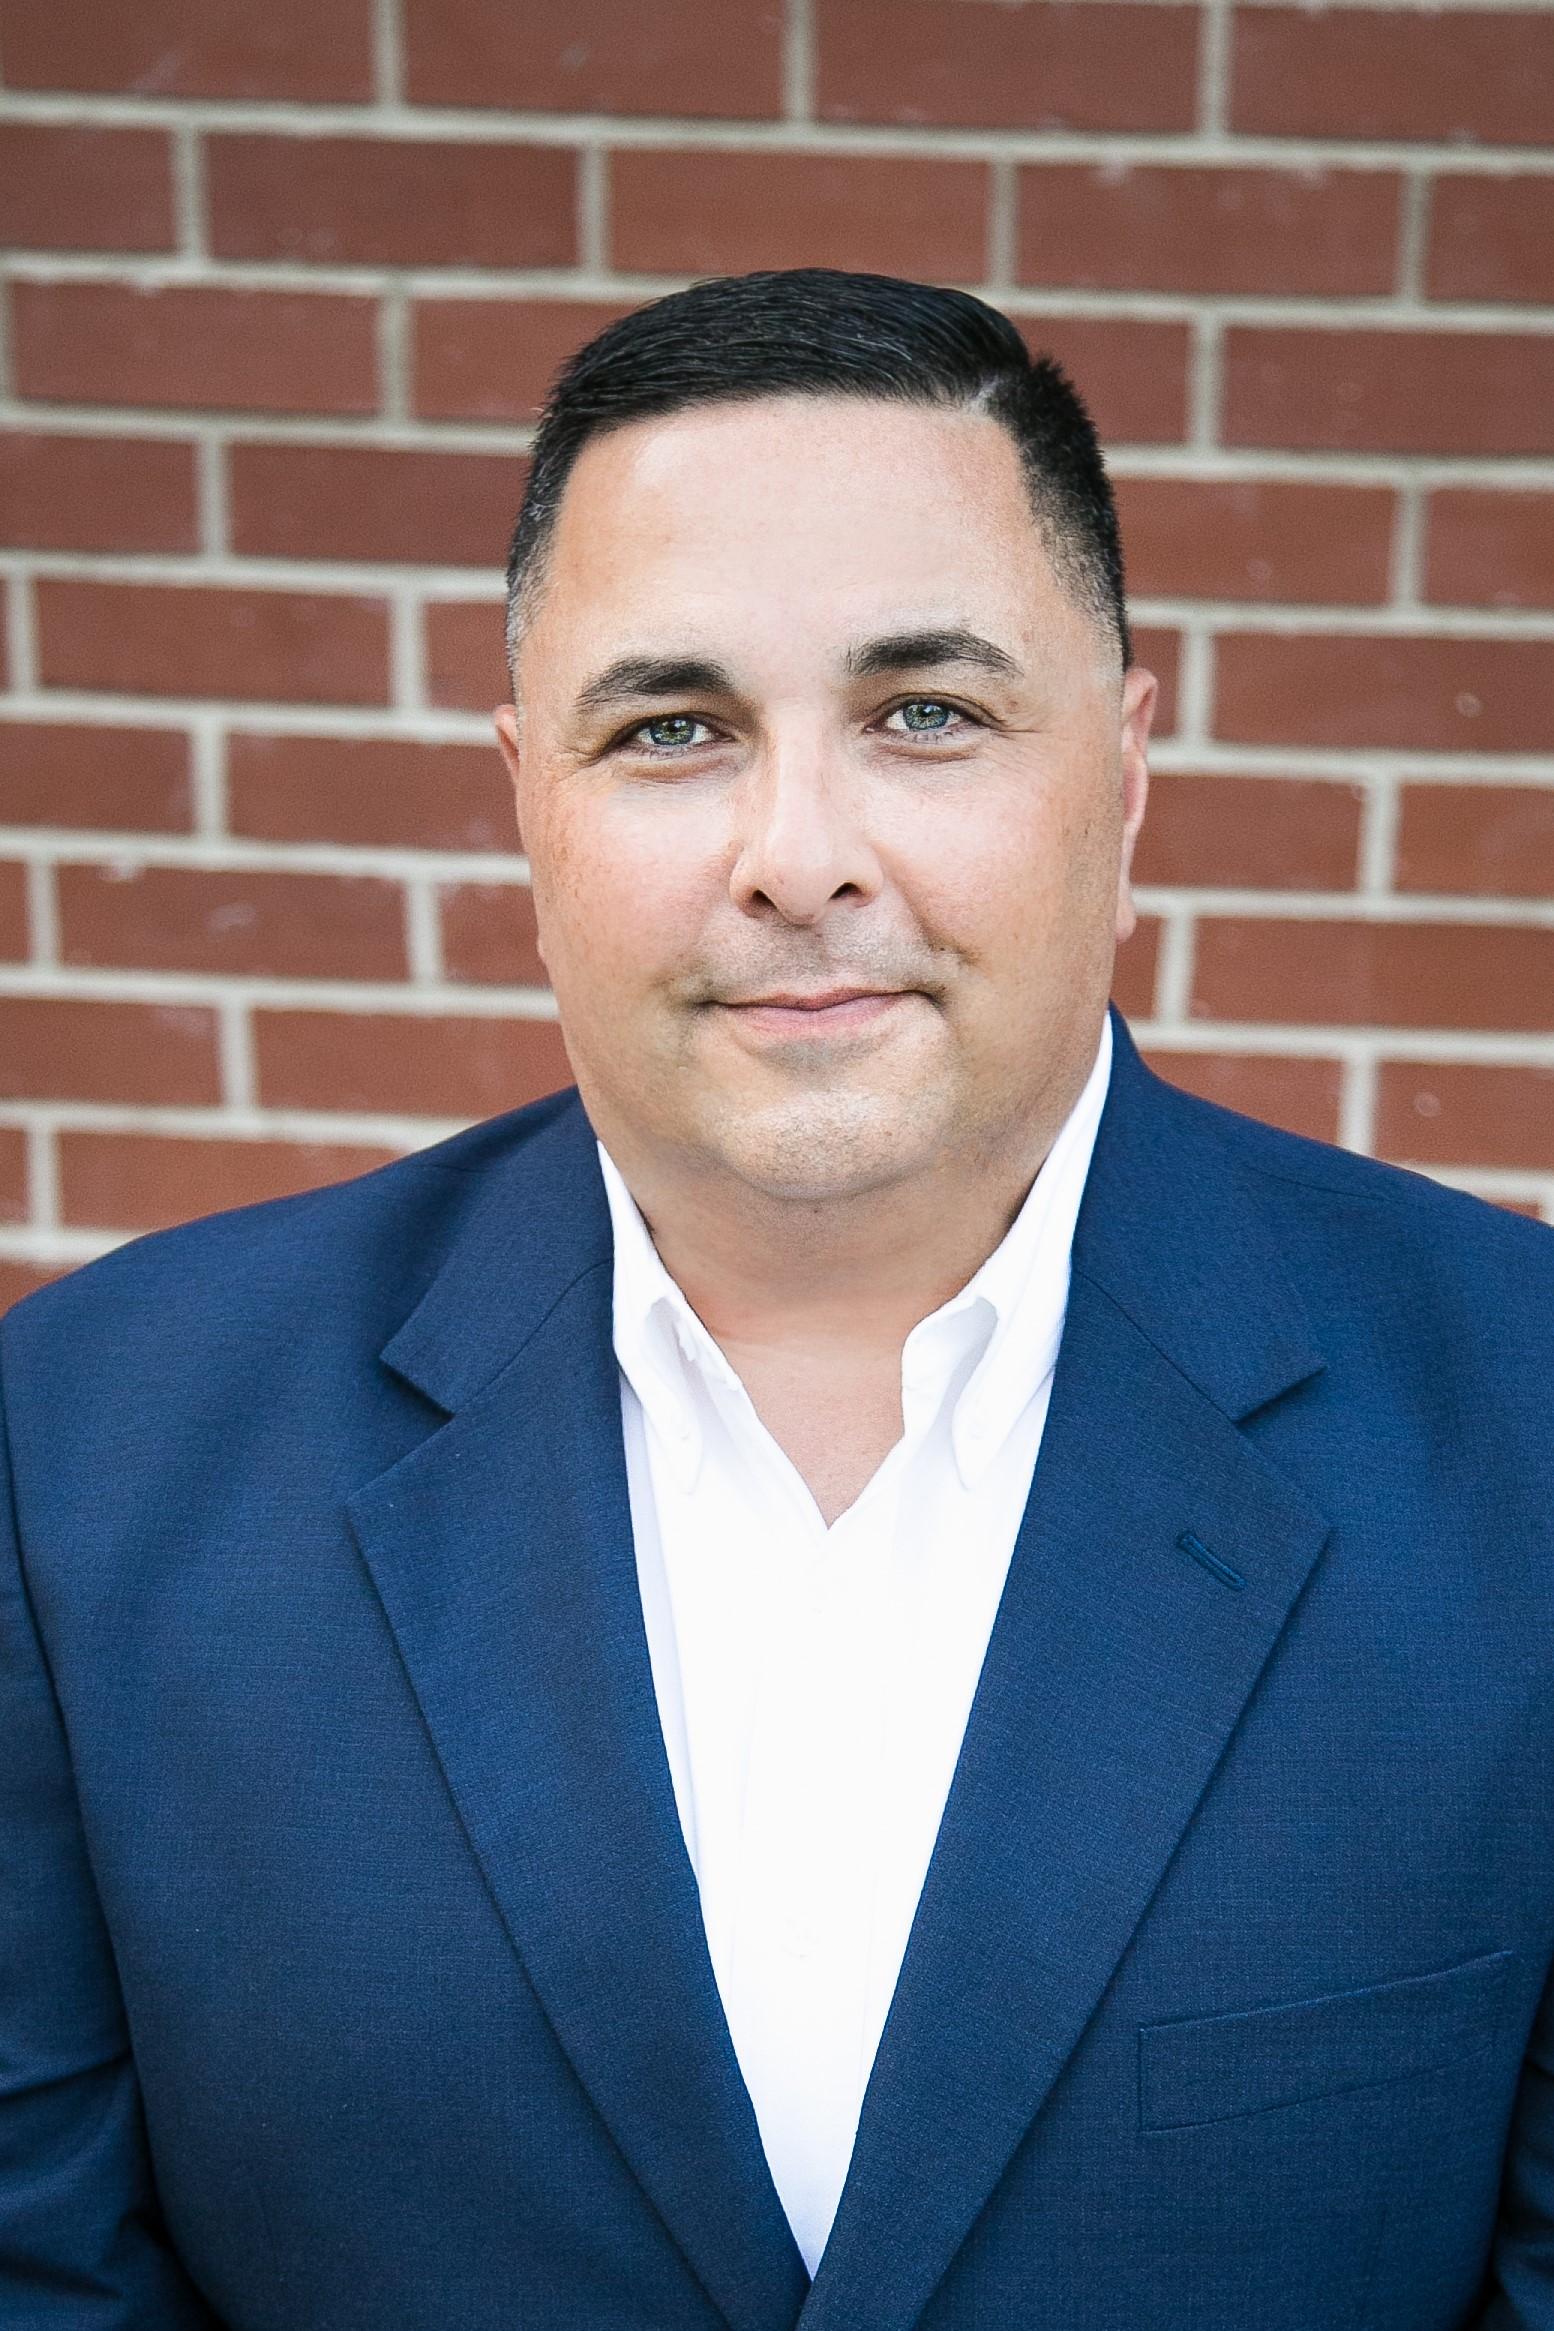 Gilbert Noriega - Farmers Insurance Agent in Visalia, CA